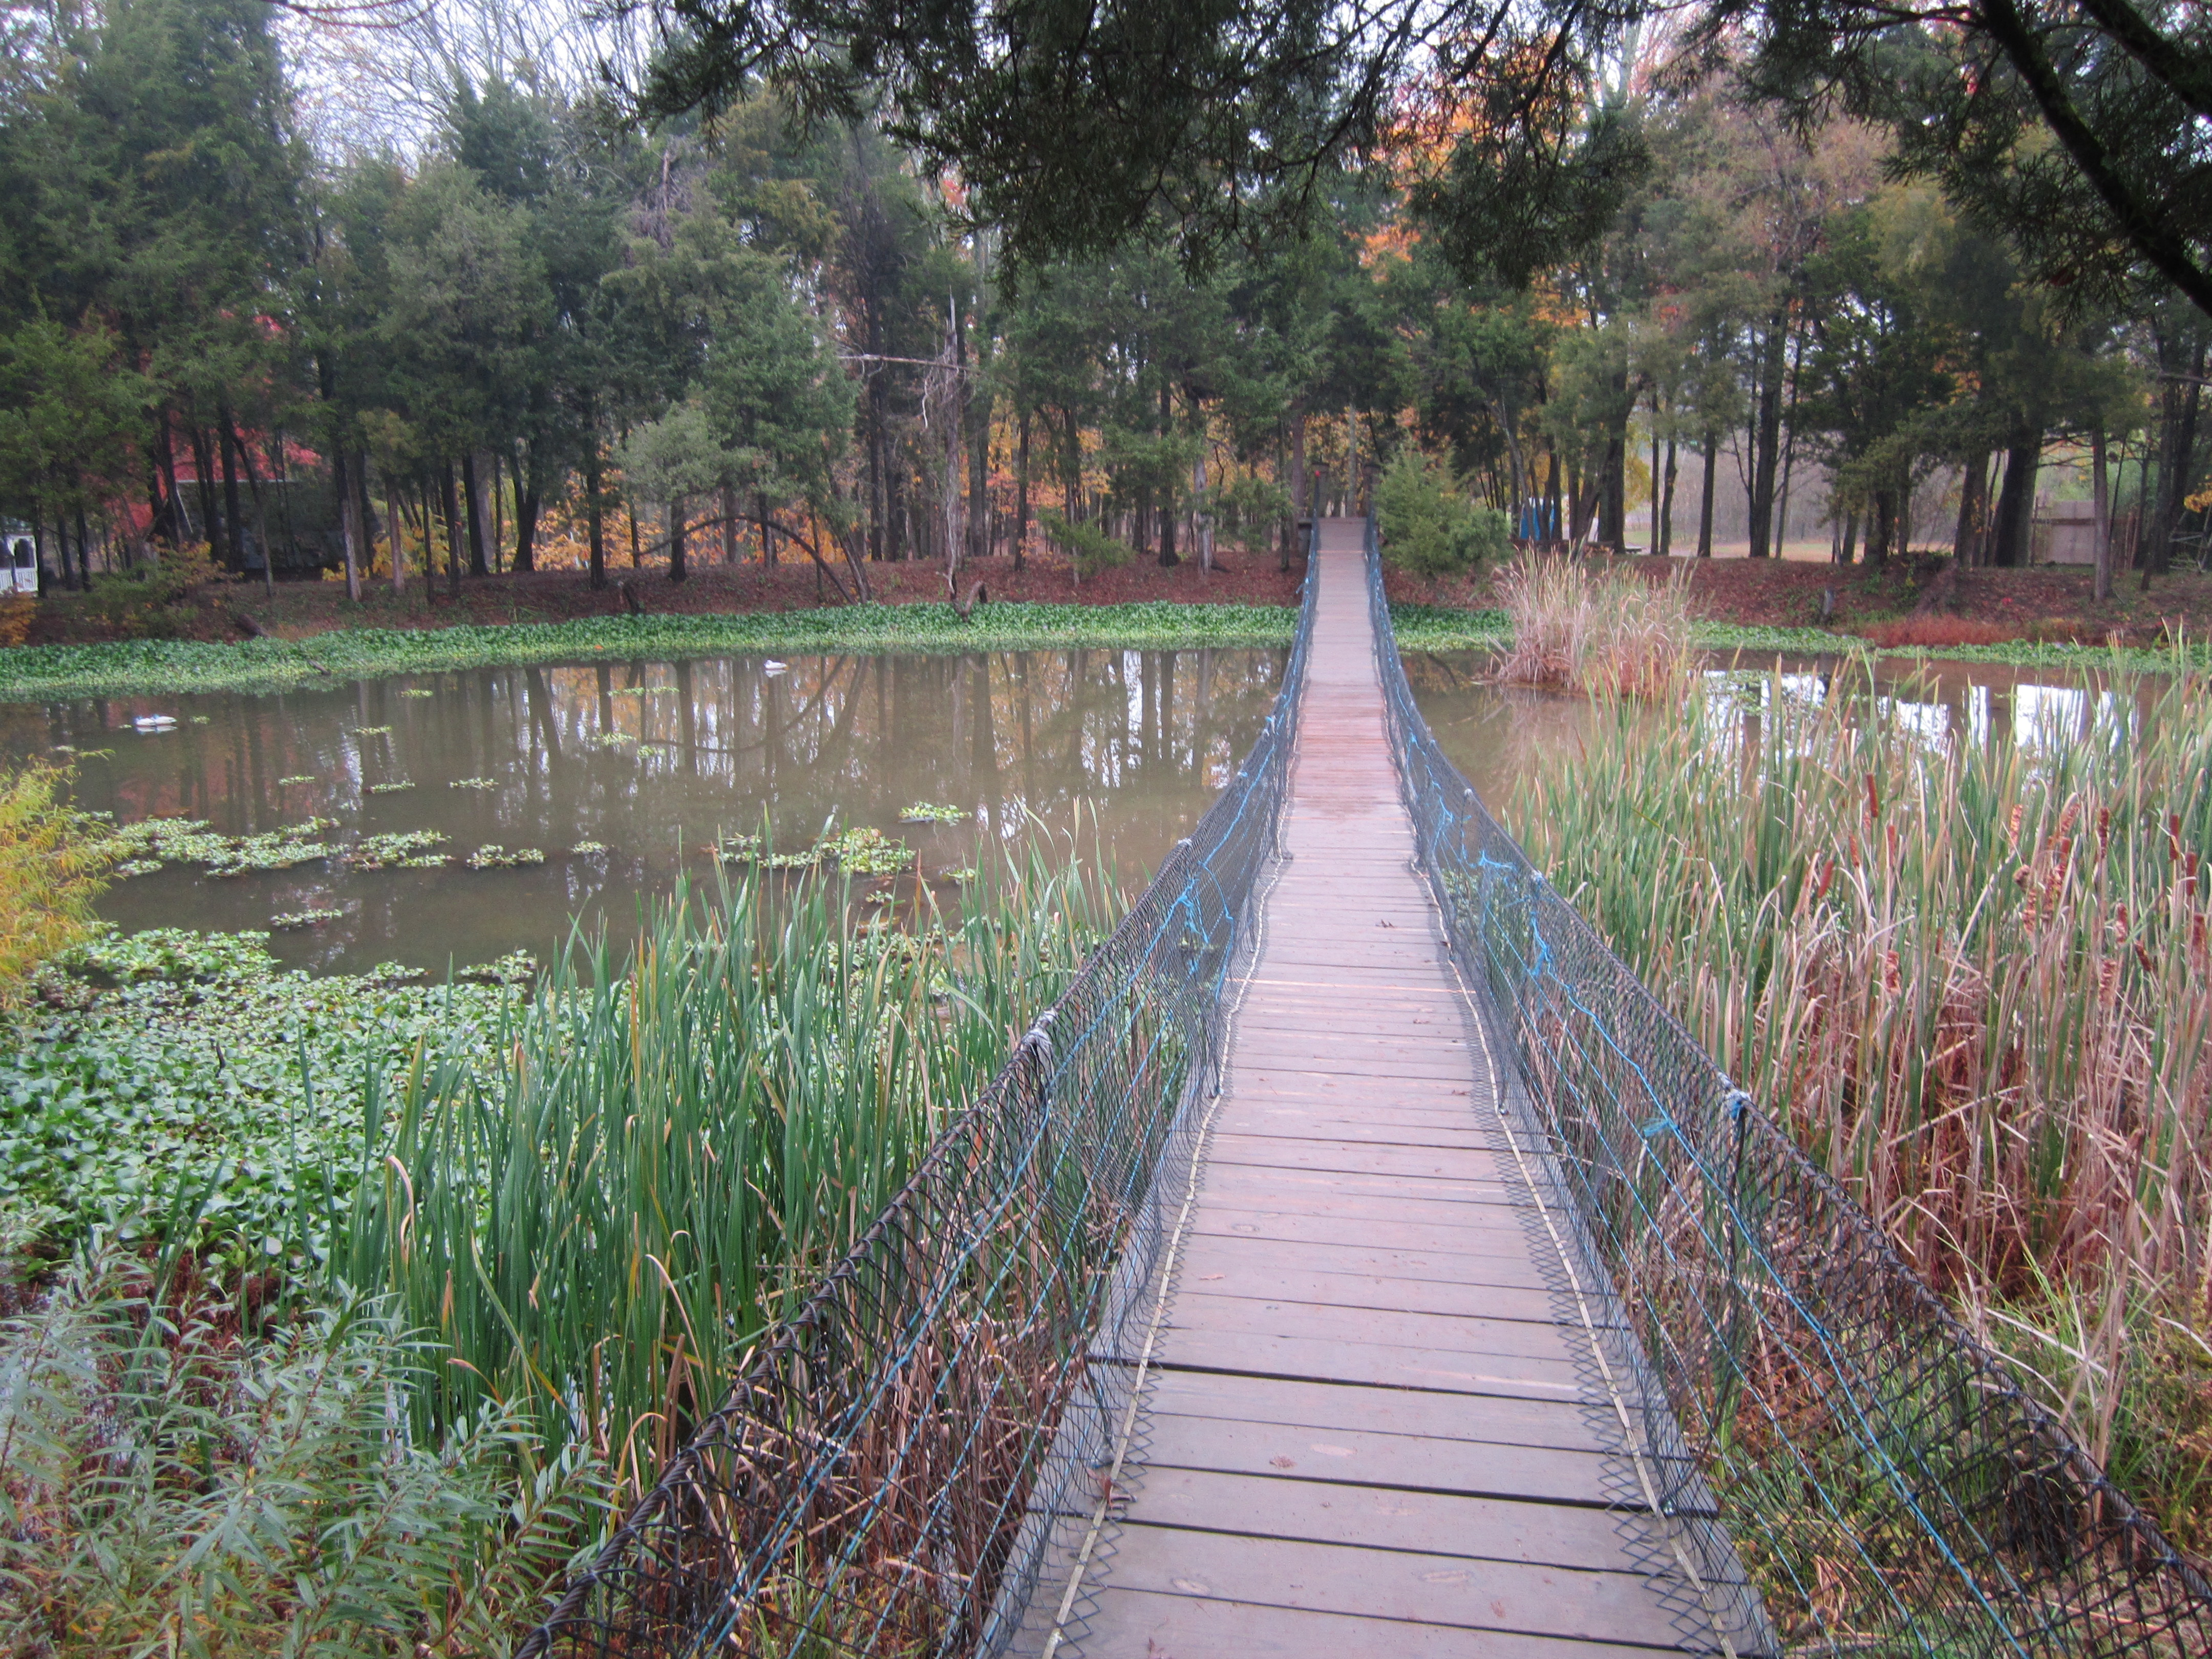 Ticonderoga_Wooden_Bridge_2